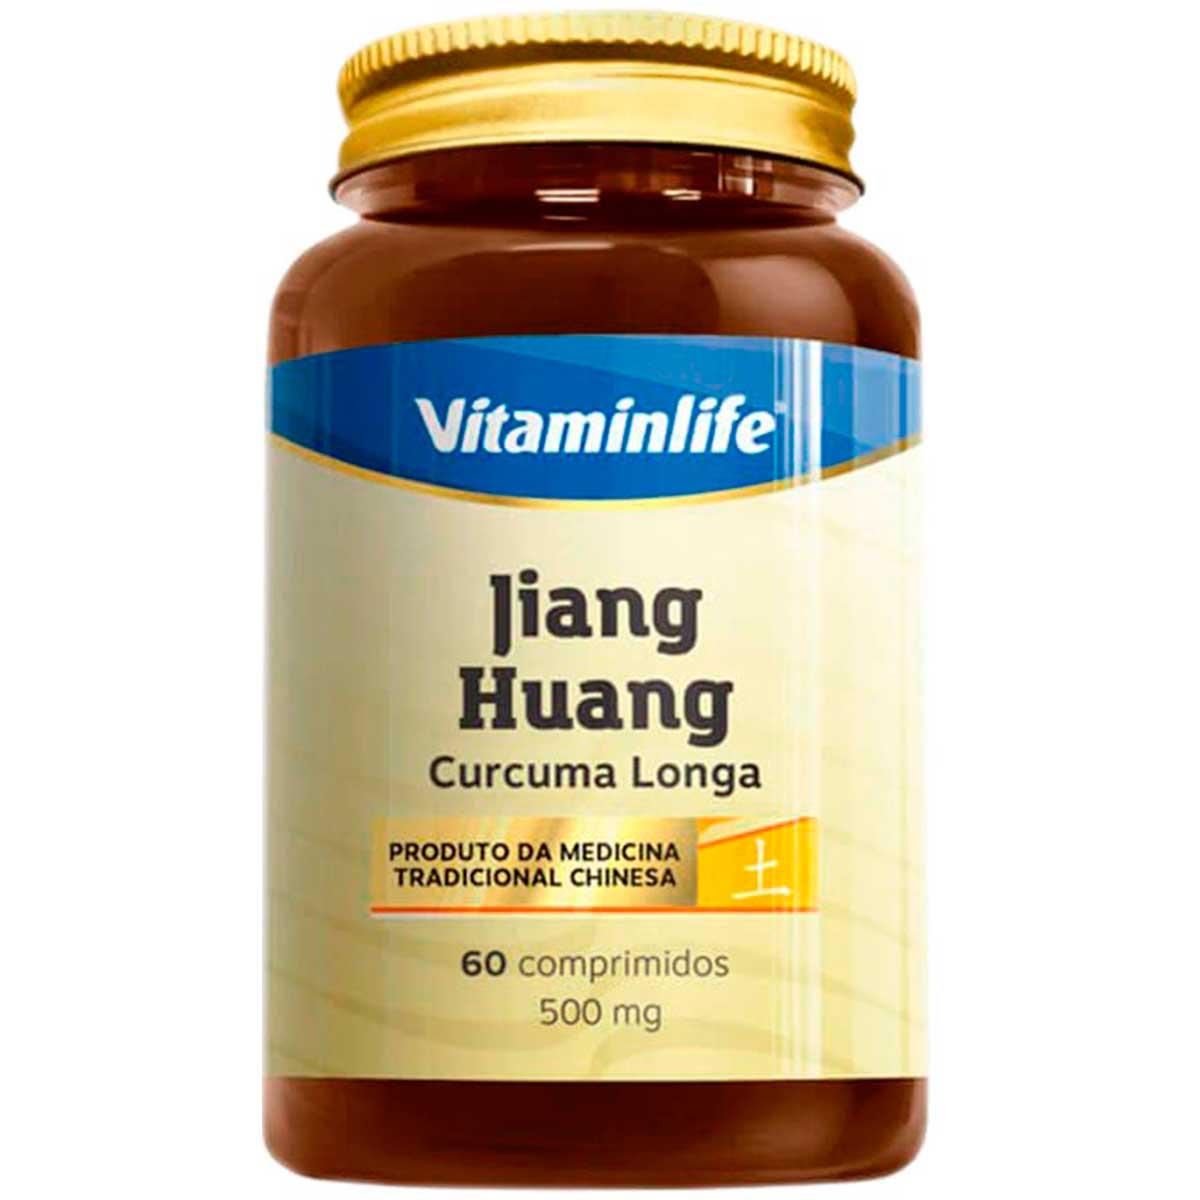 Jiang Huang Curcuma Longa 500mg 60 Cápsulas - Vitaminlife